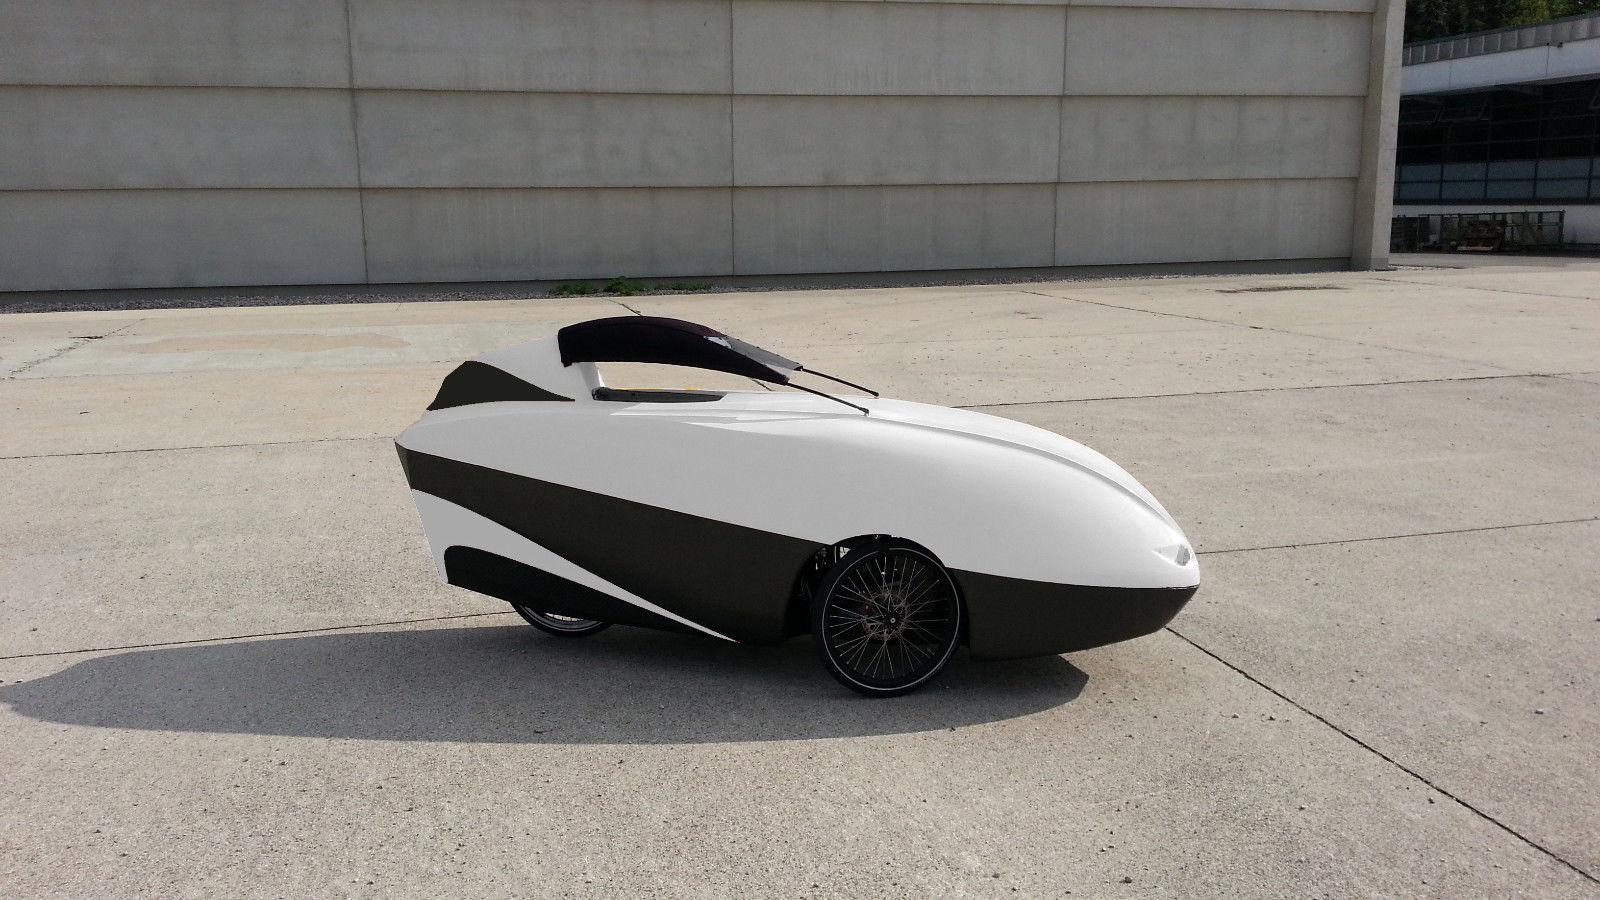 Velomobil CD Konstruktion Fertigung Trike Carbon Verkleidung Scorpion Velomobile